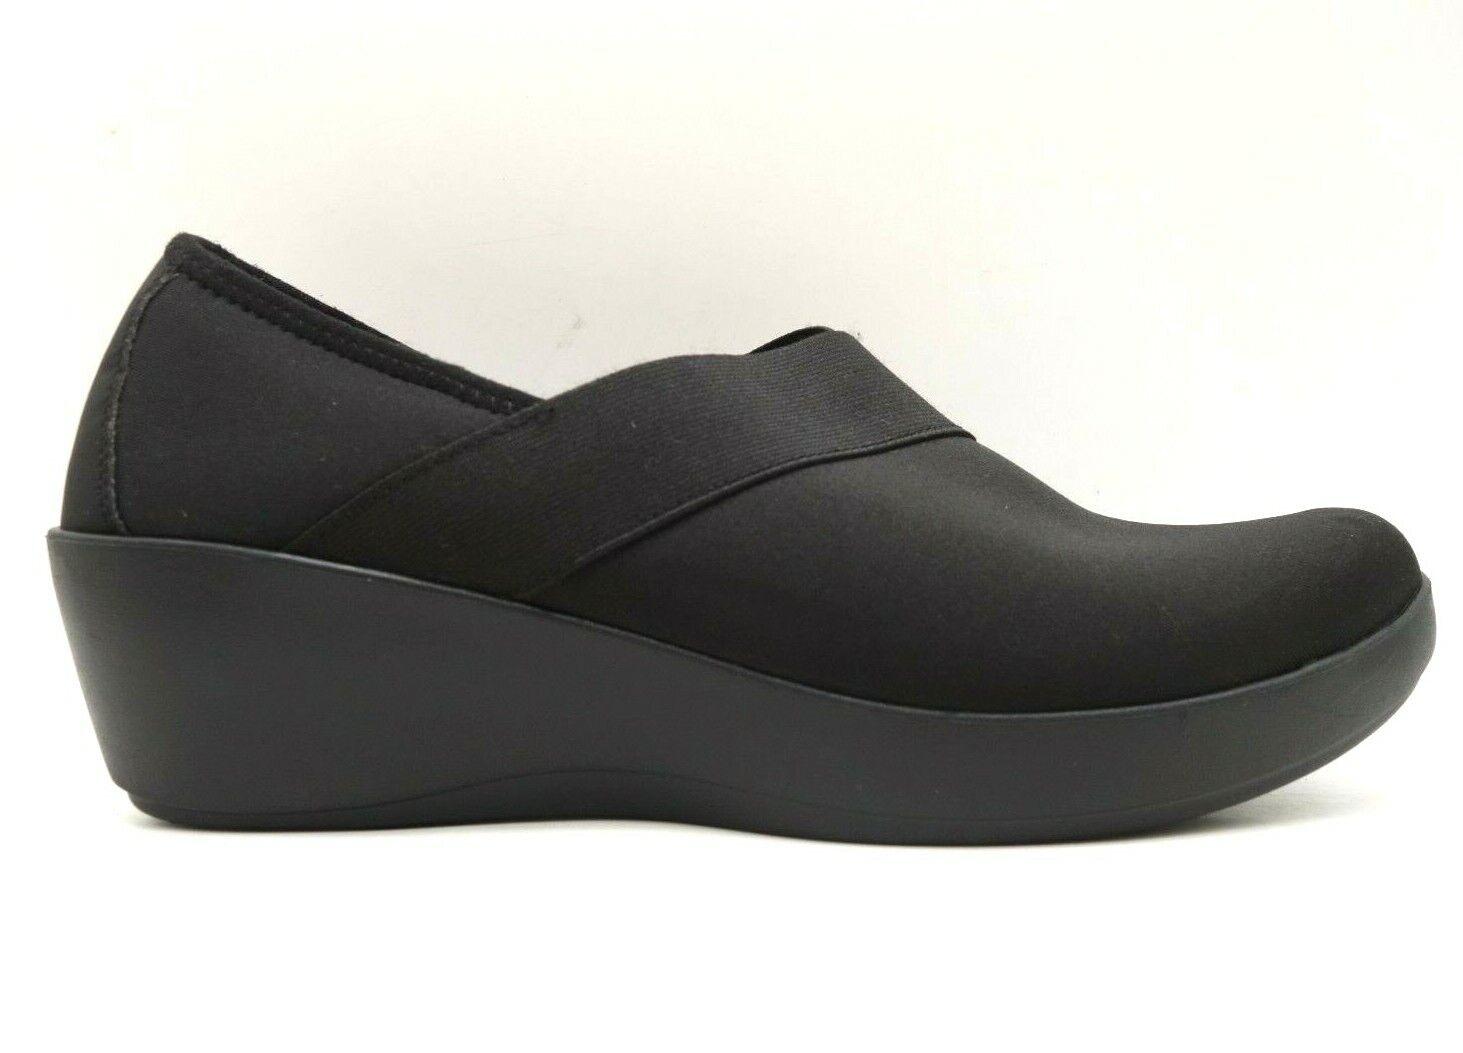 Crocs Black Dress Casual Slip On Wedge Heel Loafers Shoes Women's 11